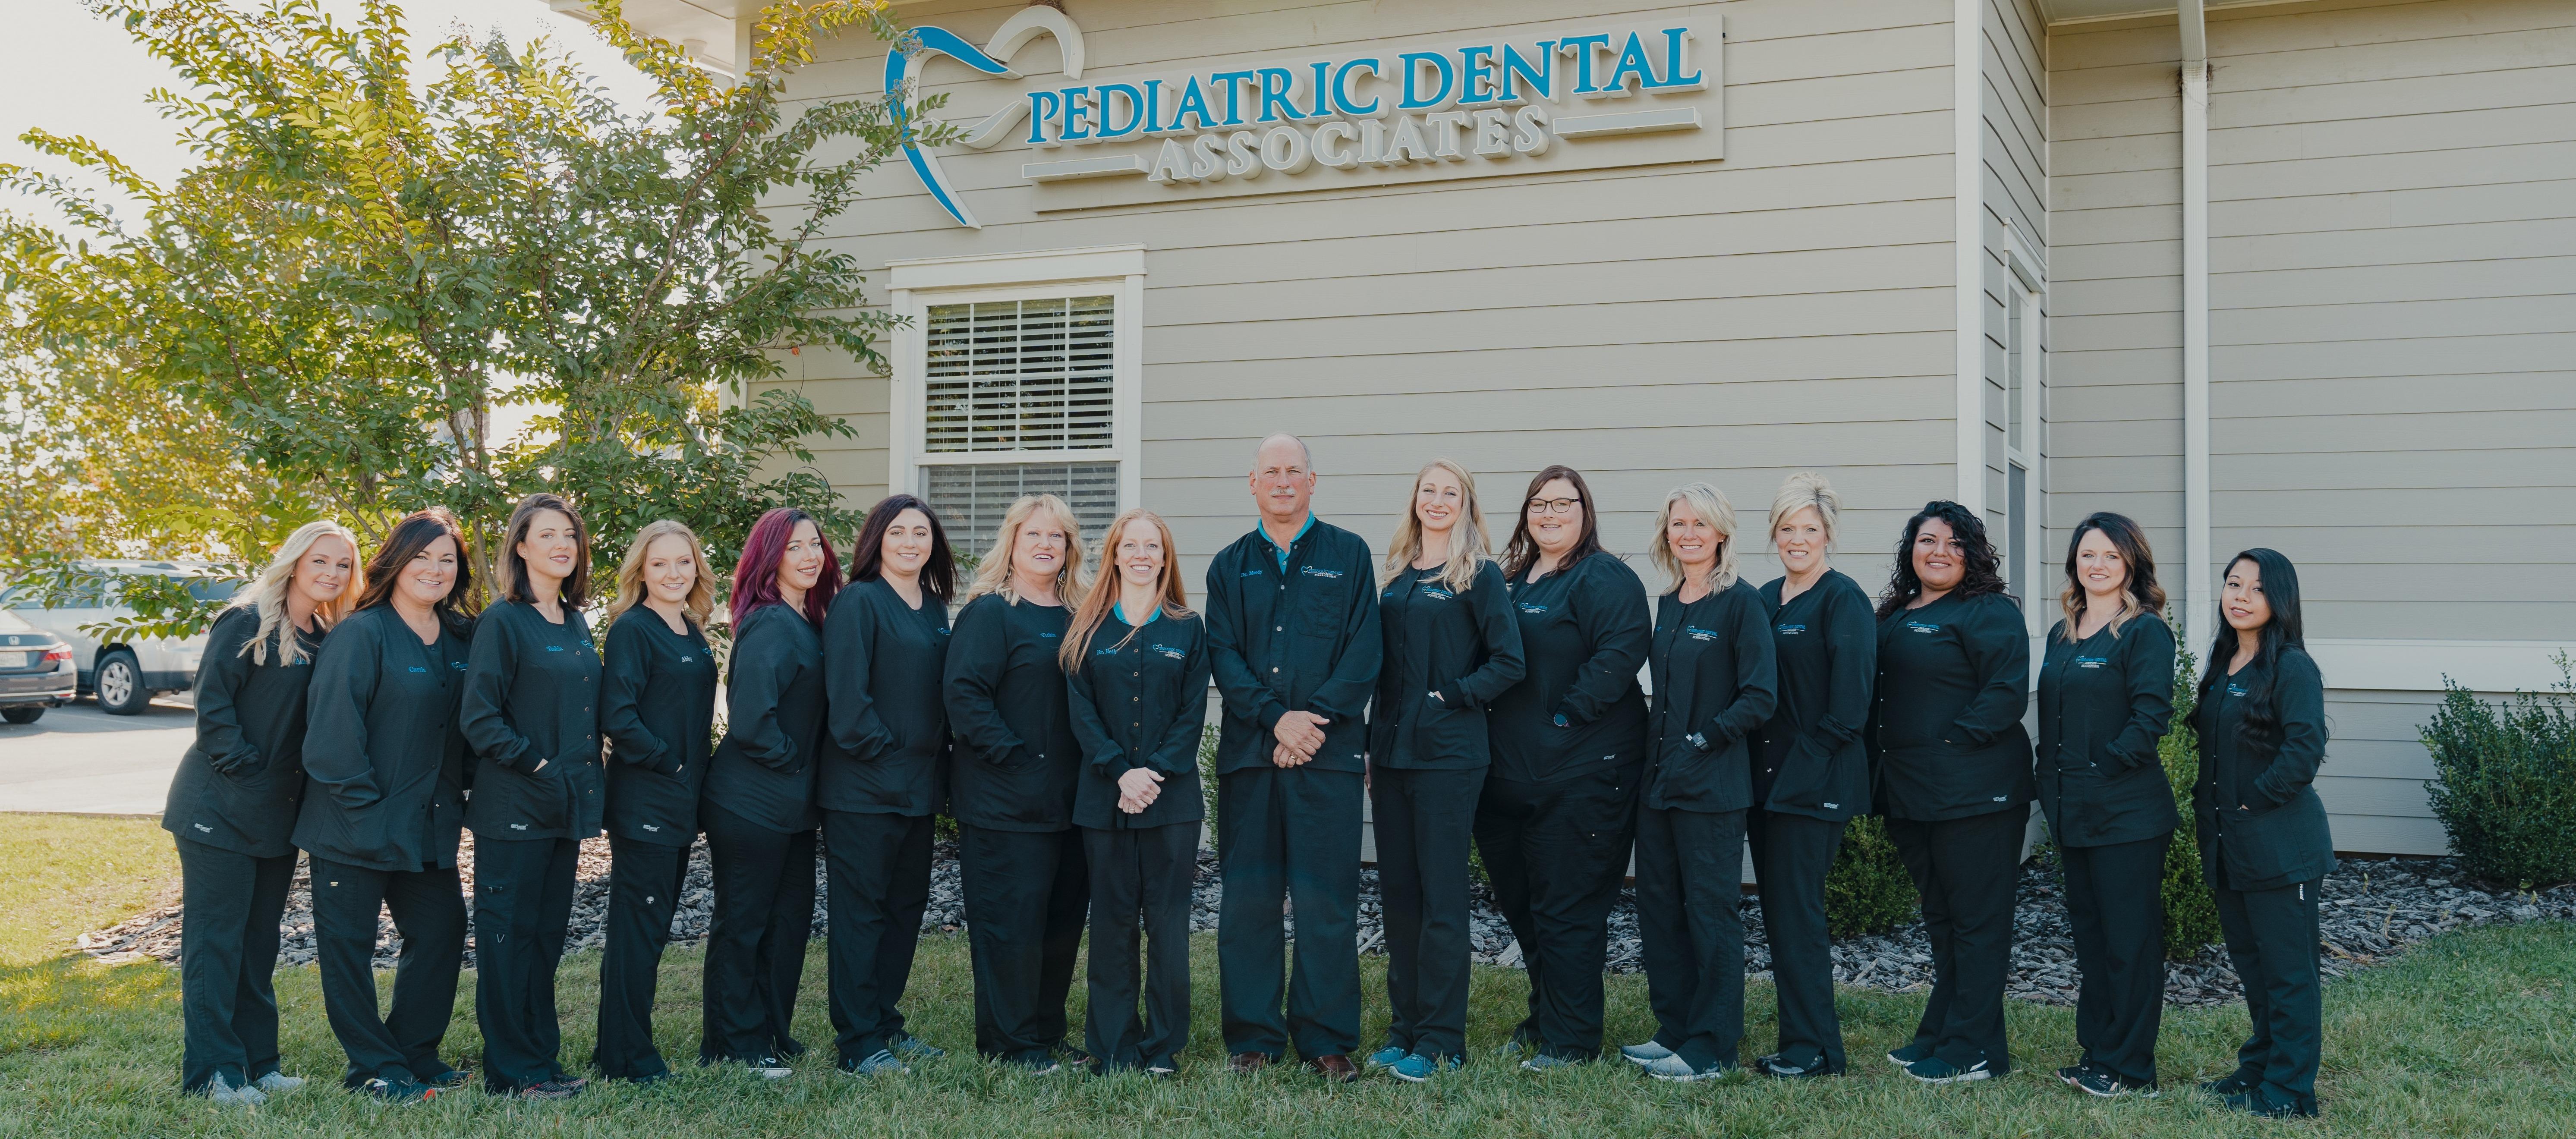 Pediatric Dental Associates reviews | Pediatric Dentists at 3005 W Andrew Johnson Hwy - Morristown TN